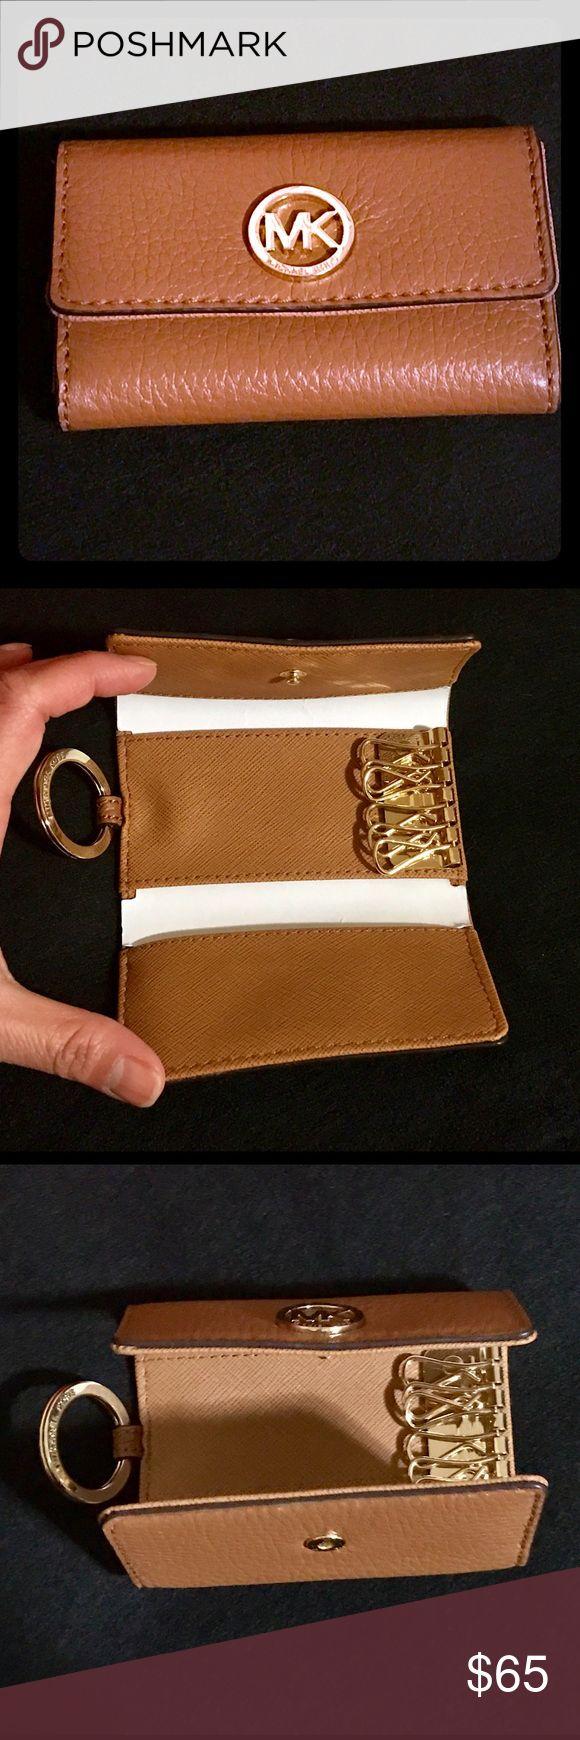 ✨Michael Kors Fulton Acorn key case✨ Brand new with tag Michael Kors Accessories Key & Card Holders